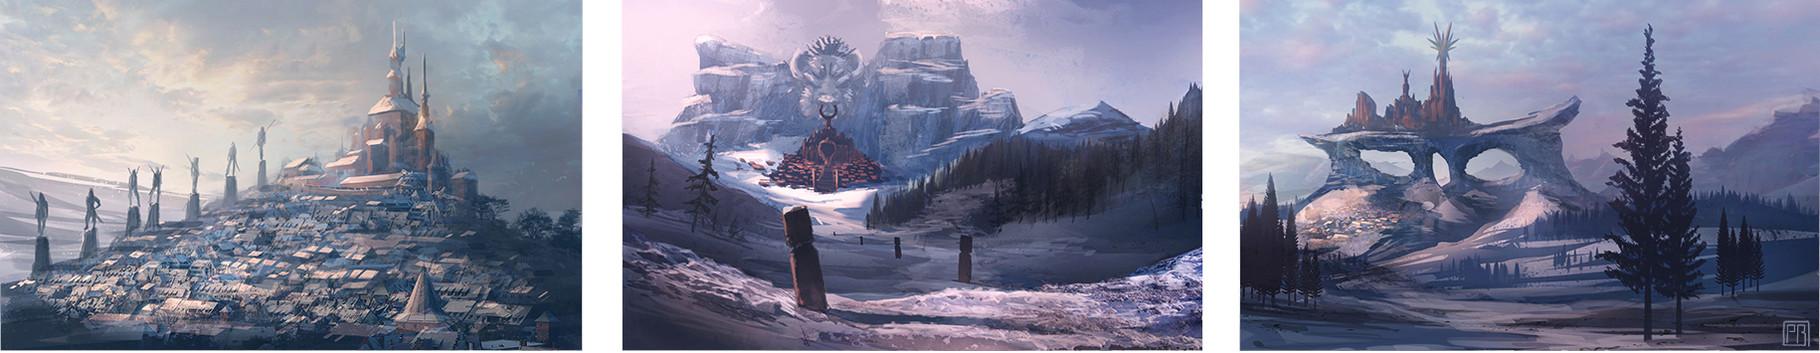 Snowy Castles - Peter Bartels